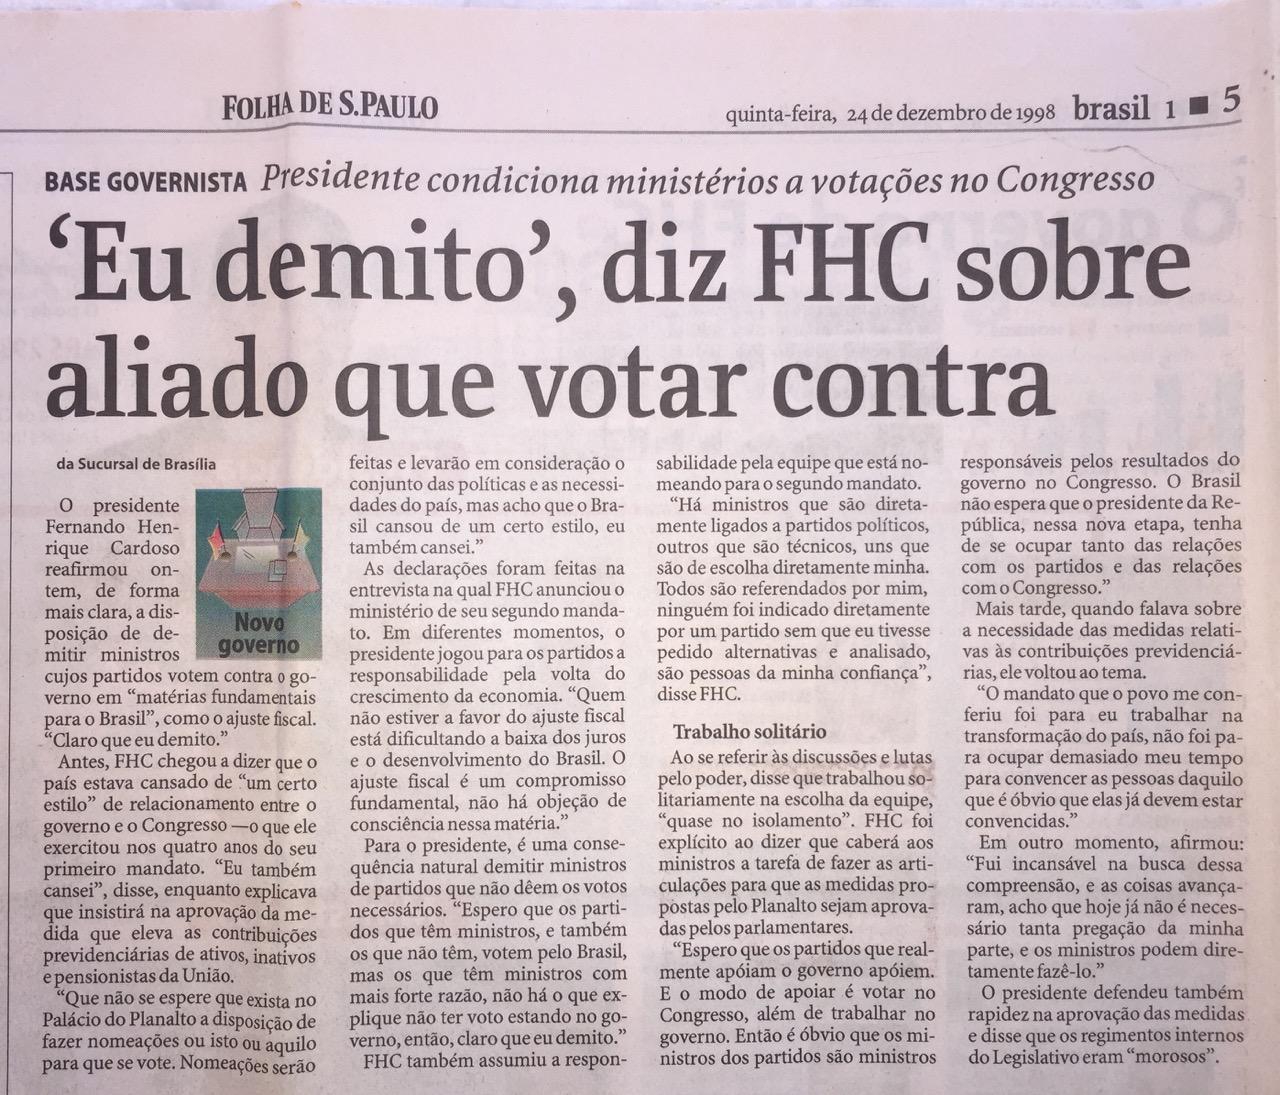 Folha-5a-pagina-24dez1998